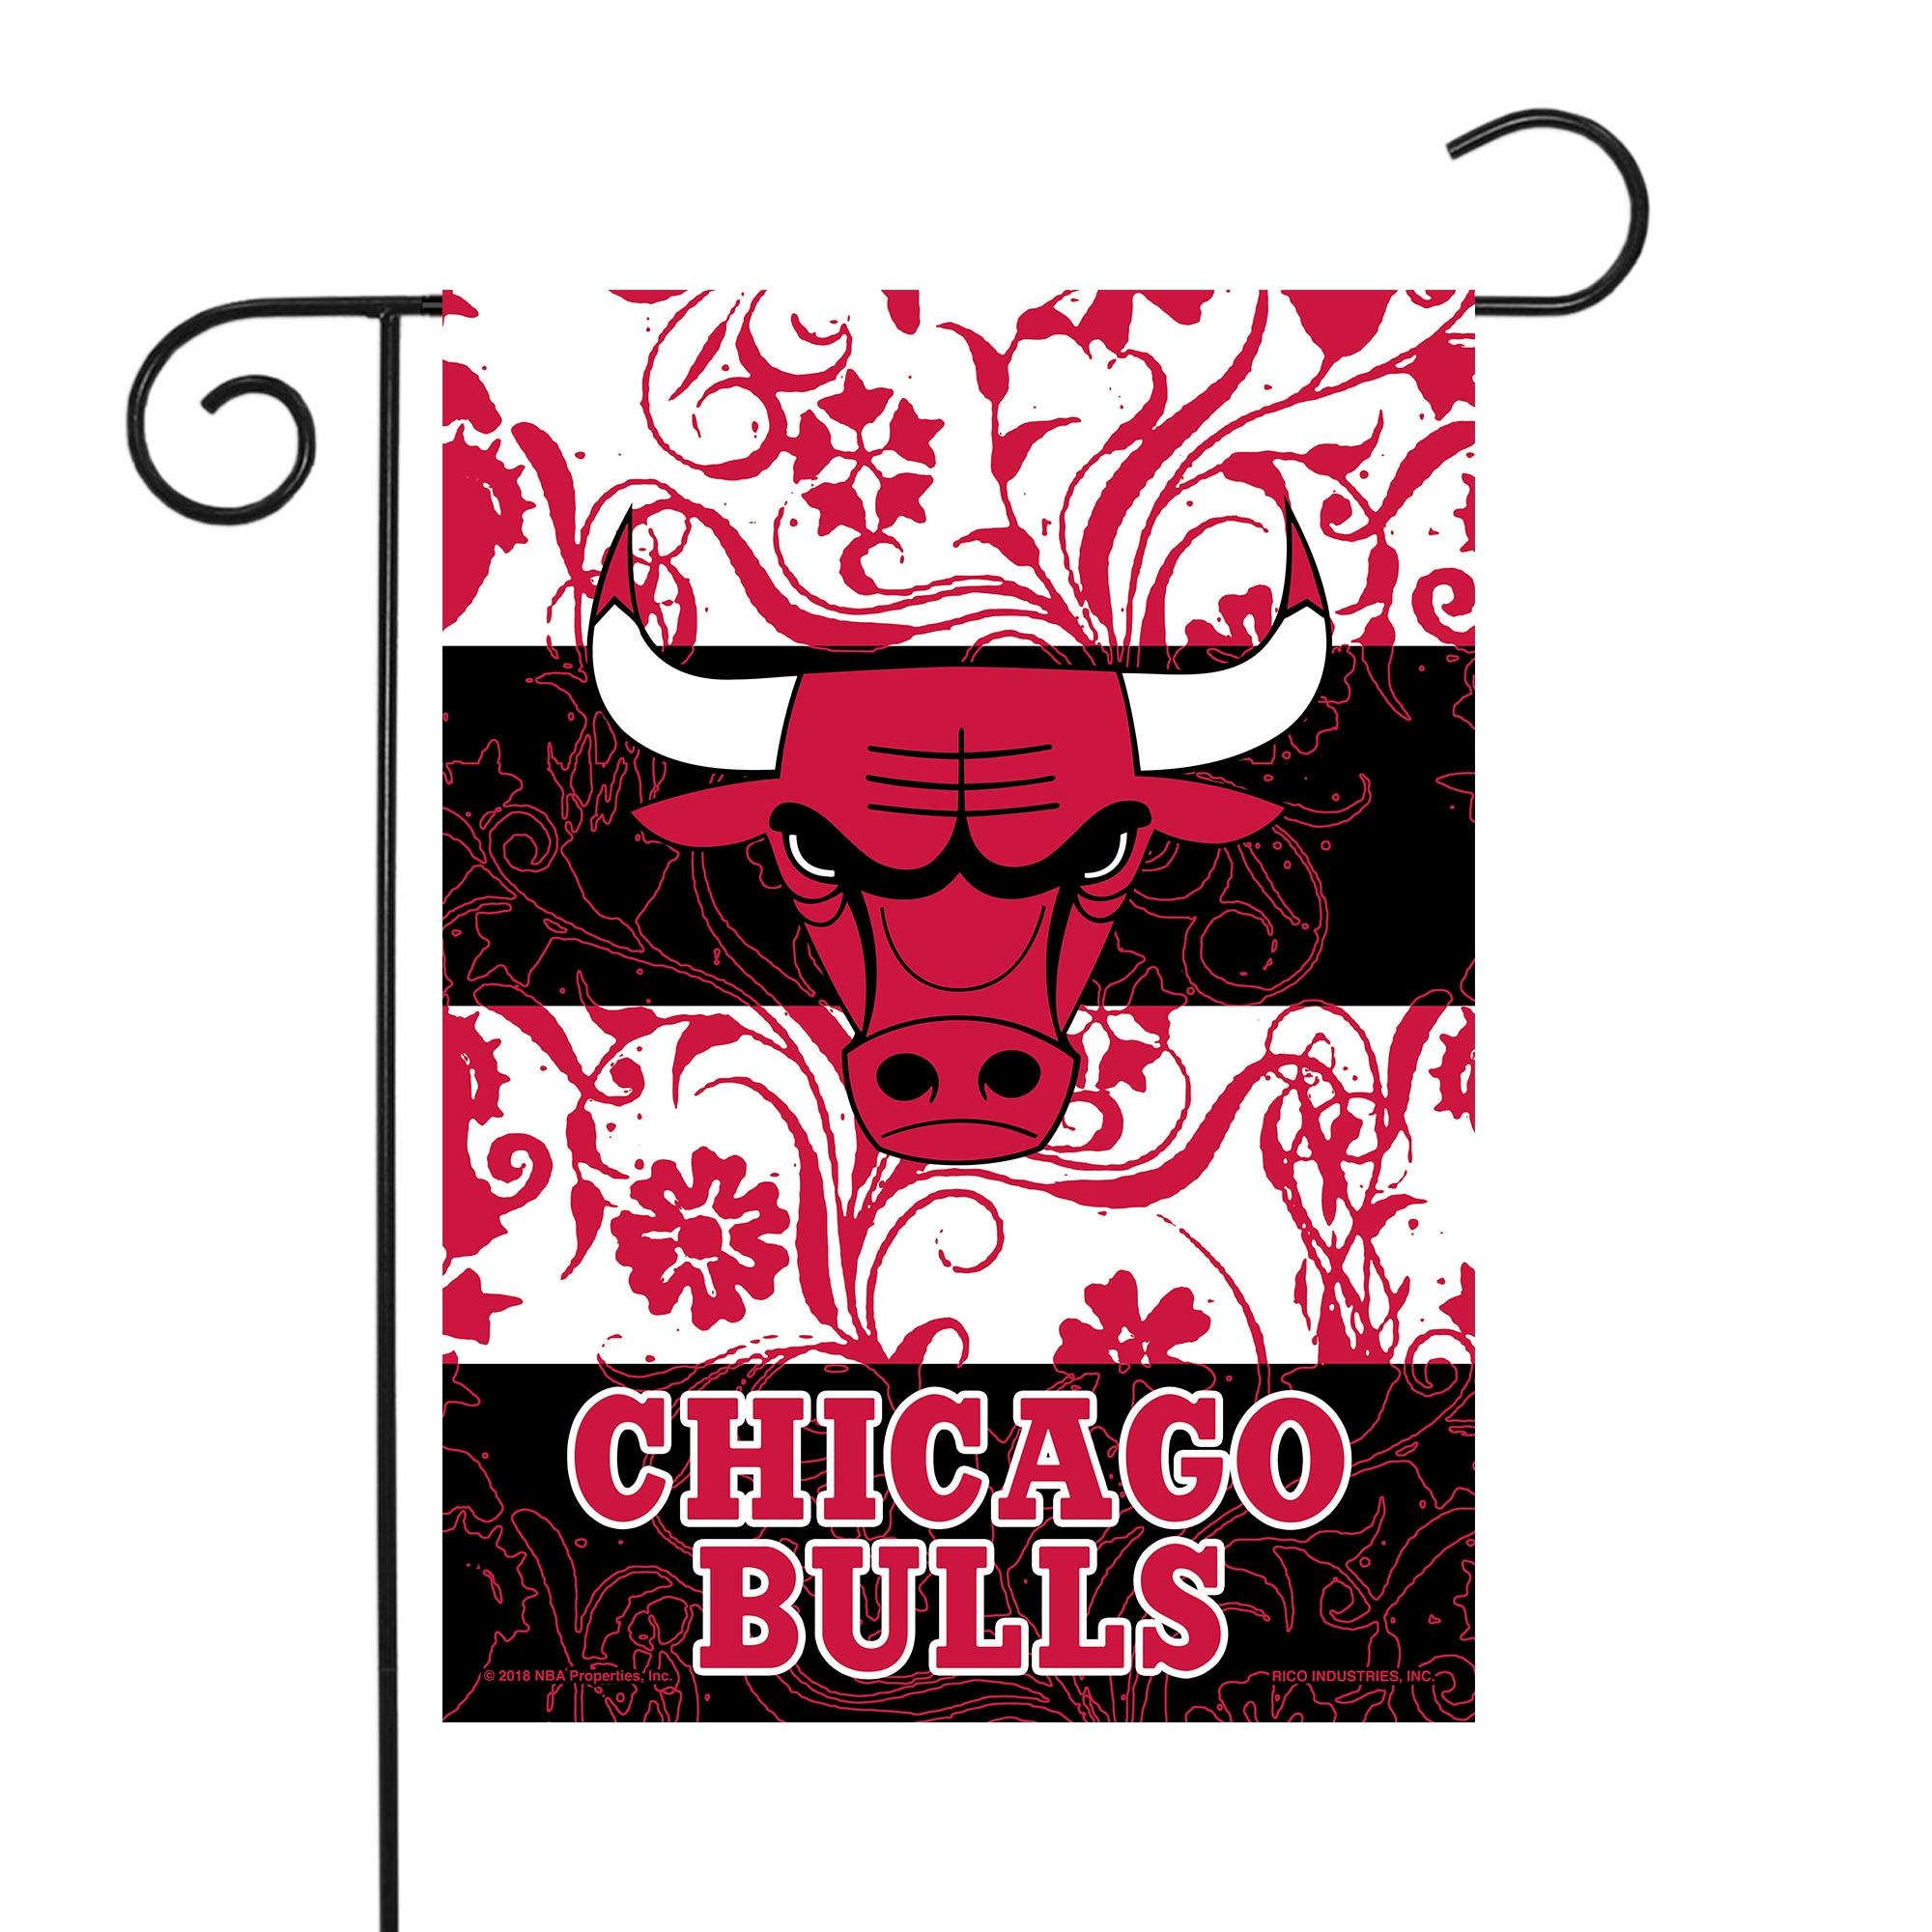 "Chicago Bulls Sparo 13"" x 18"" Double-Sided Garden Flag with Pole"